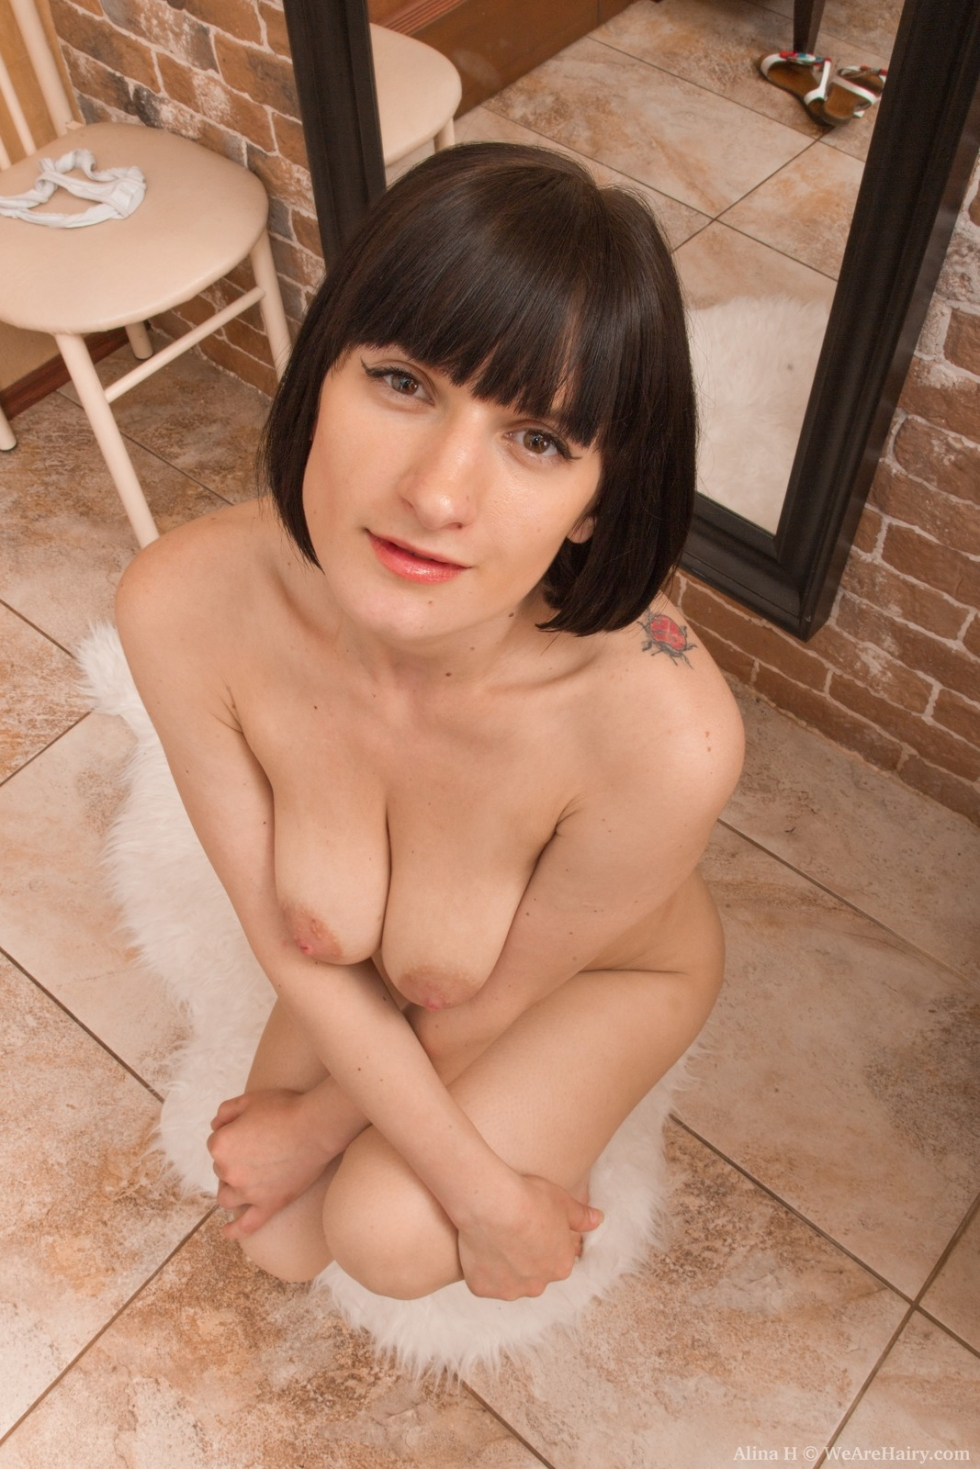 Alina h undresses and masturbates on wooden chair - 1 2